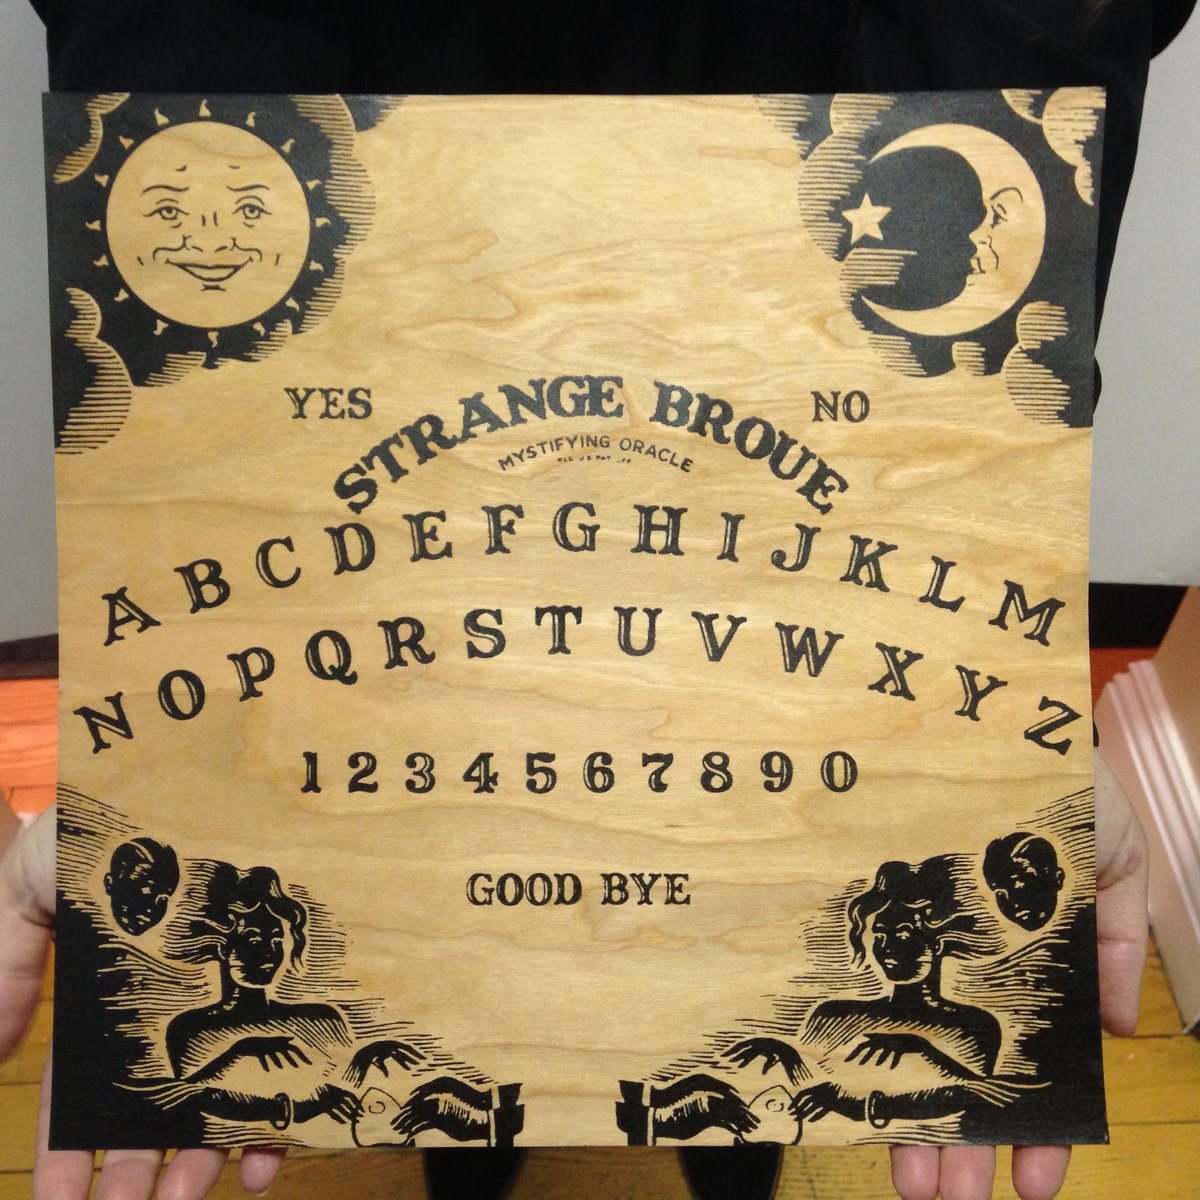 Strange Broue Strange Broue